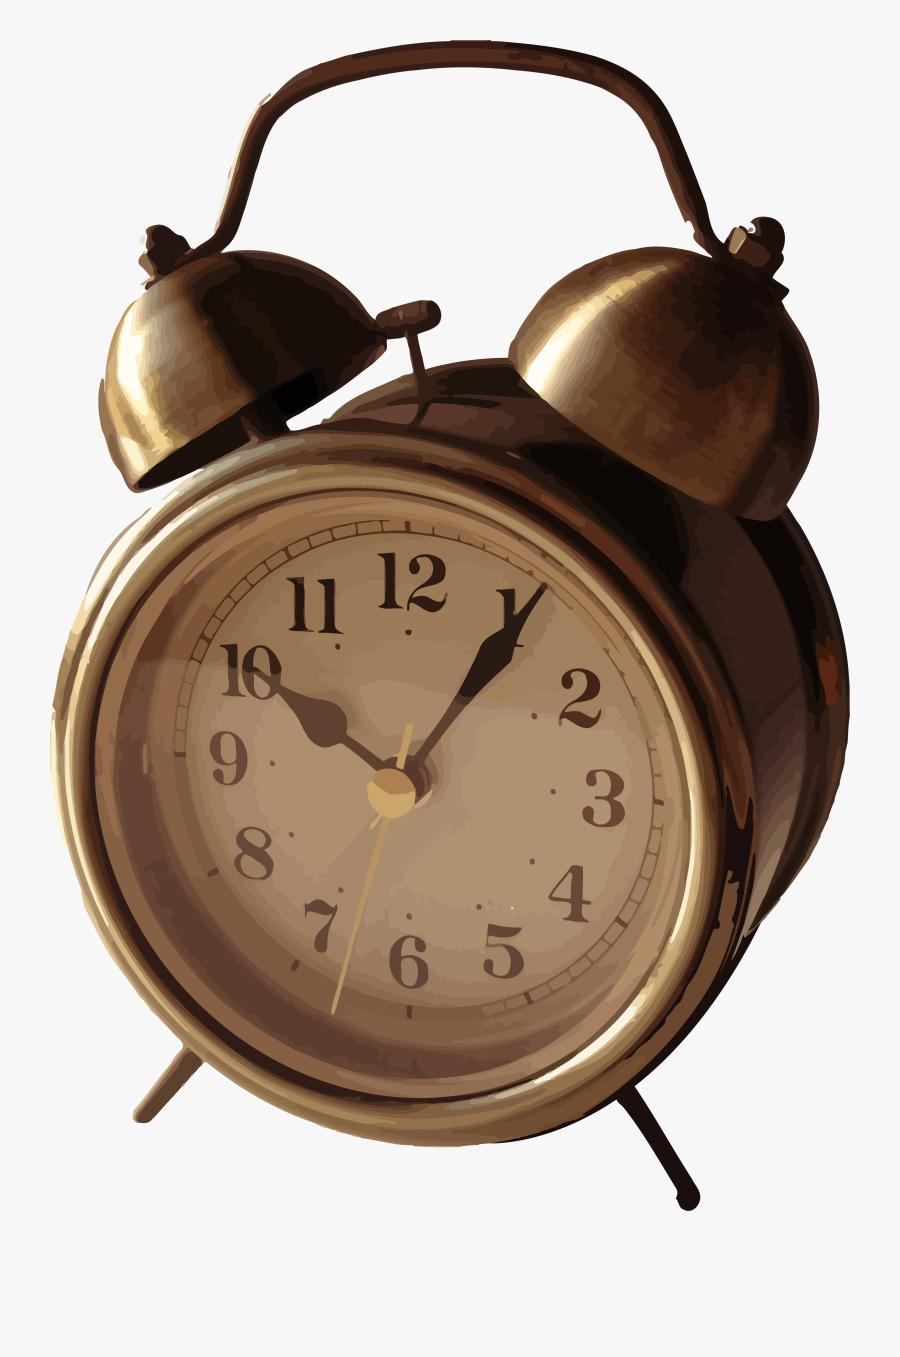 Original Alarm Clock, Transparent Clipart